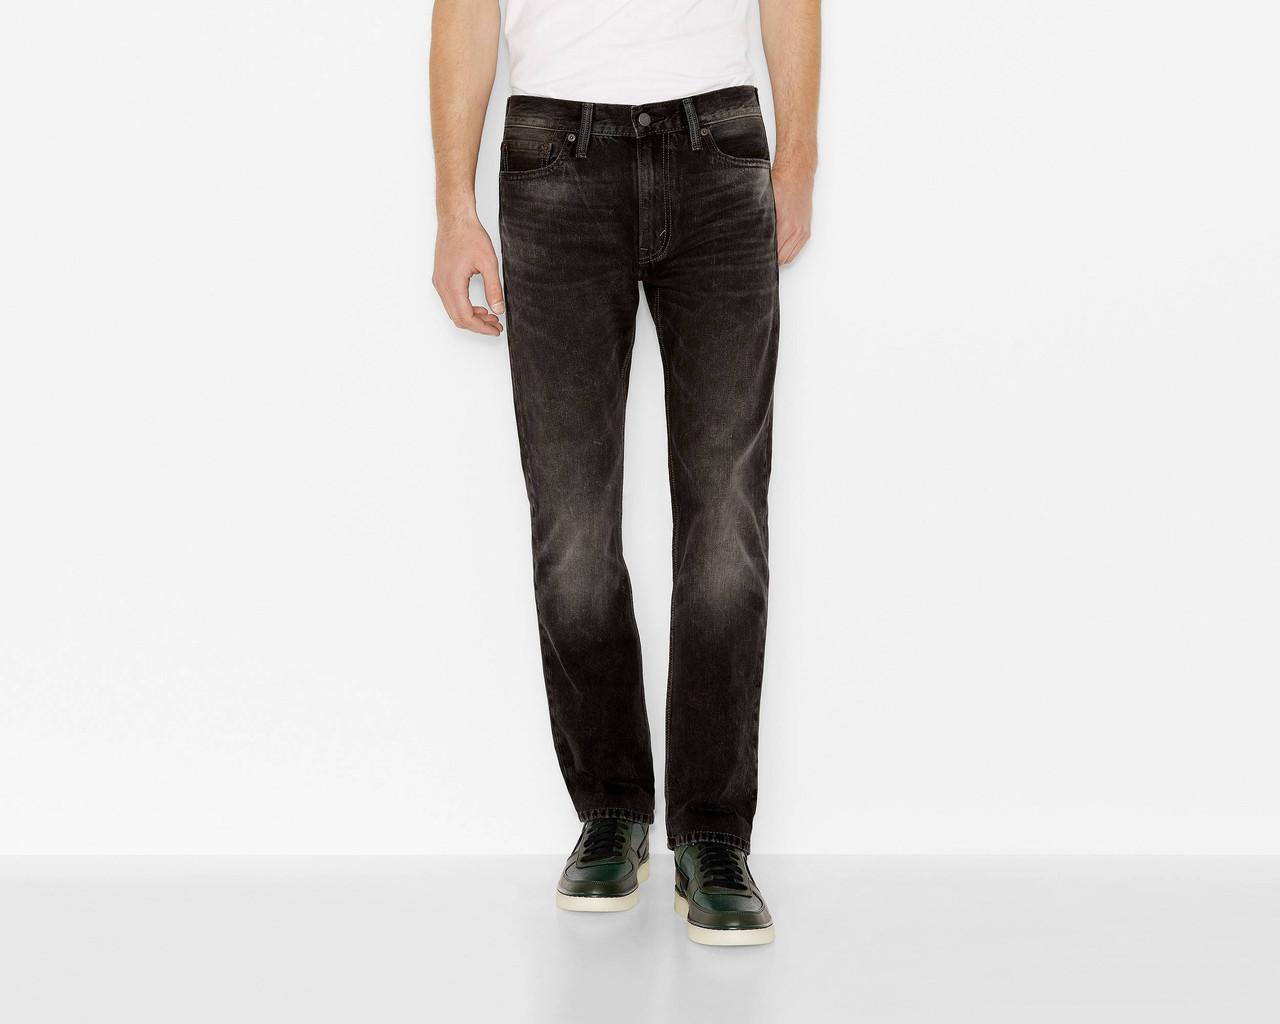 Джинсы Levi's 513 Slim Fit Straight Leg, Mad River, 38W32L, 085130594